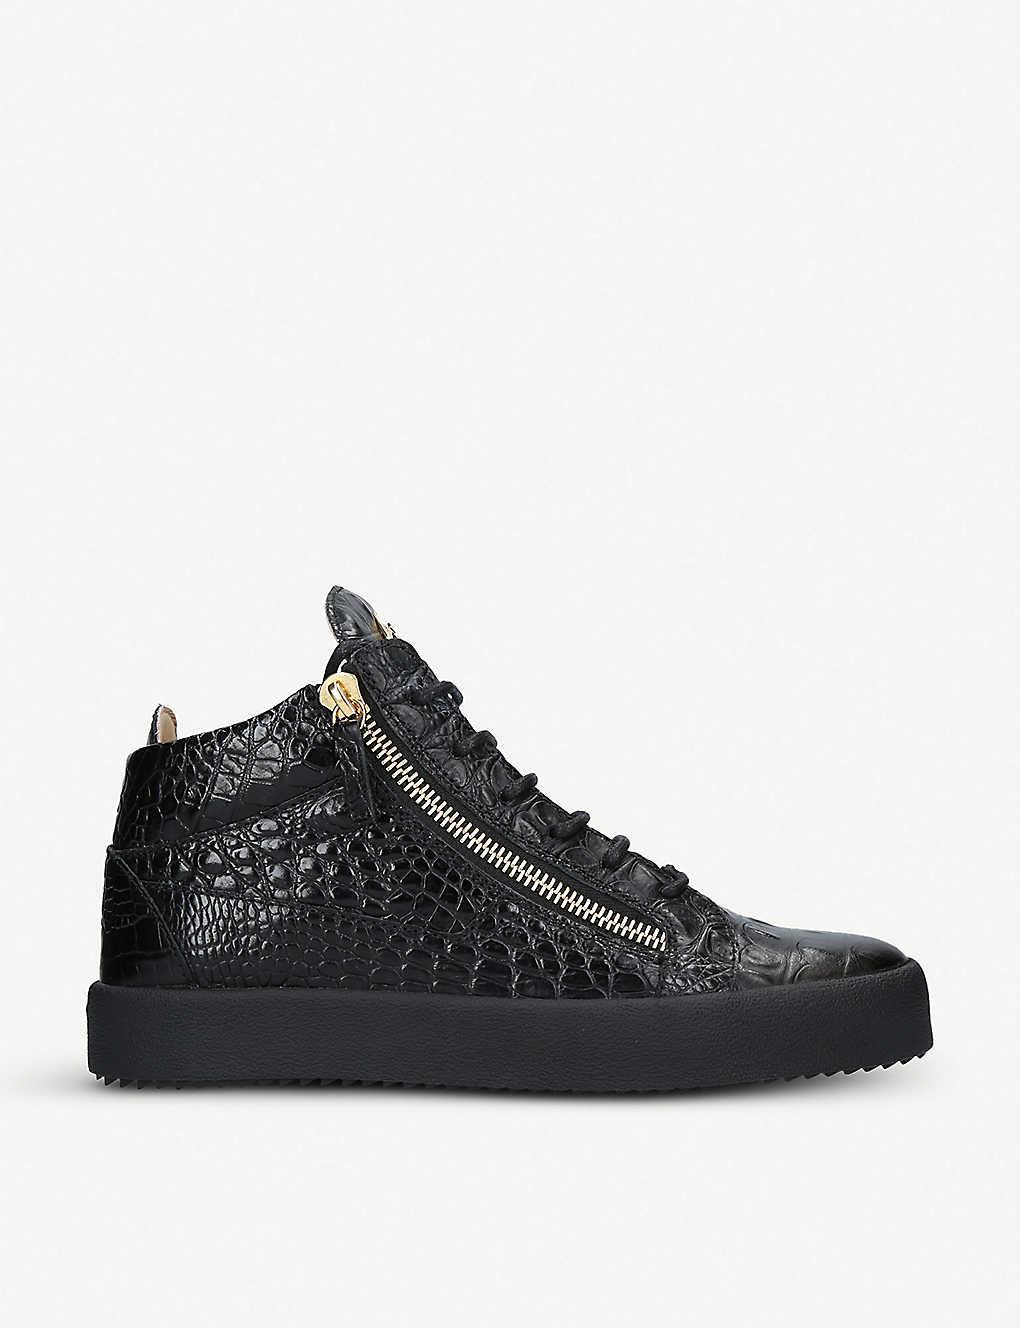 18b6c2c2e0c00 GIUSEPPE ZANOTTI - Kriss croc-embossed patent-leather high-top ...